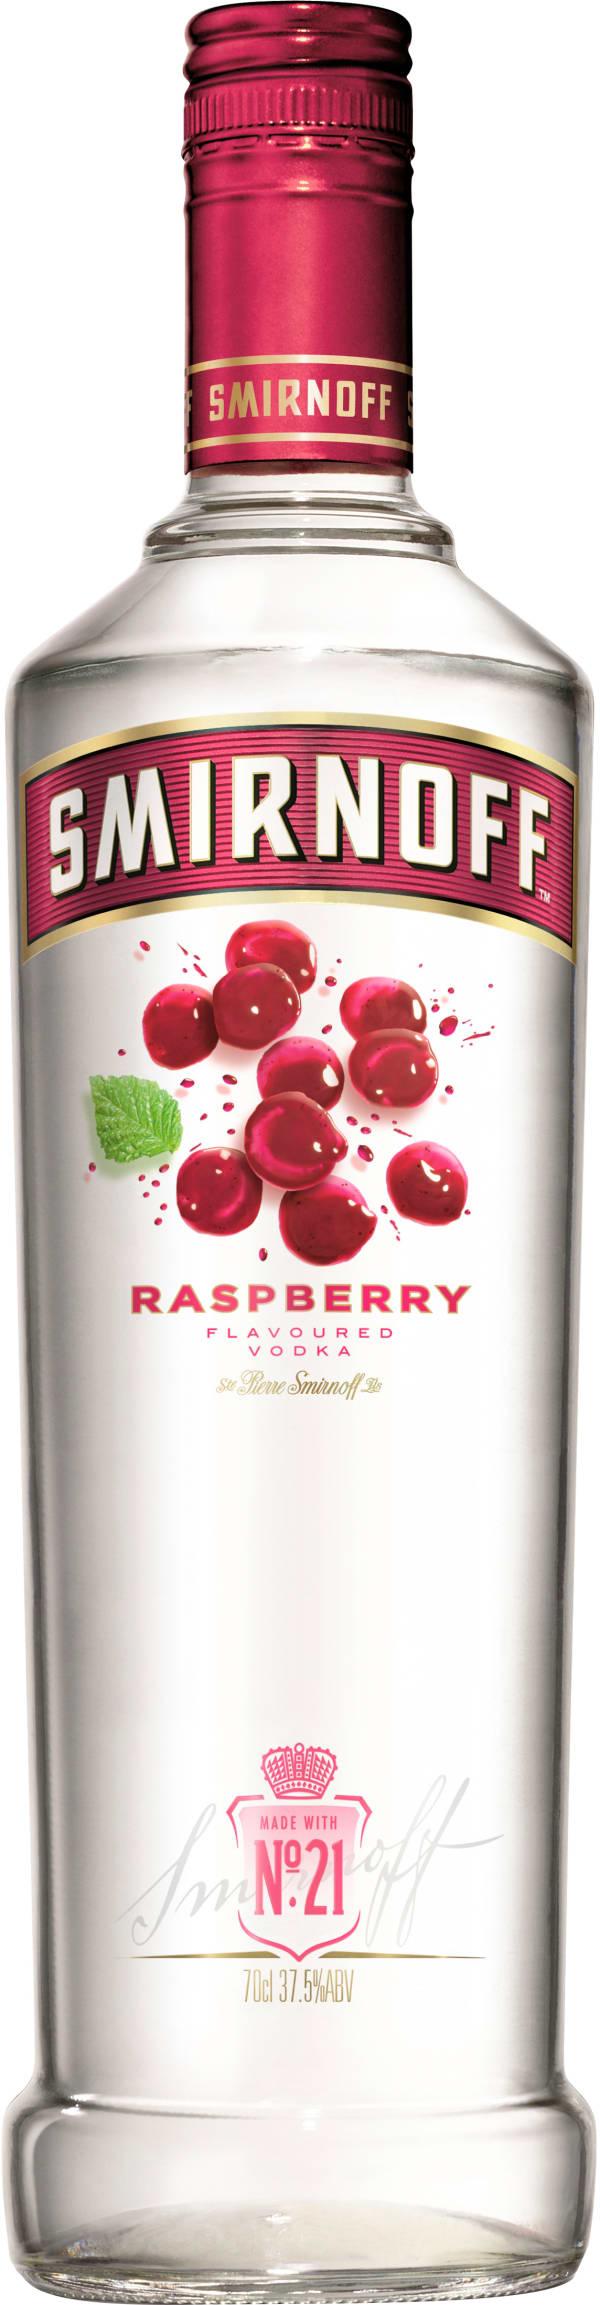 Smirnoff Rasperry